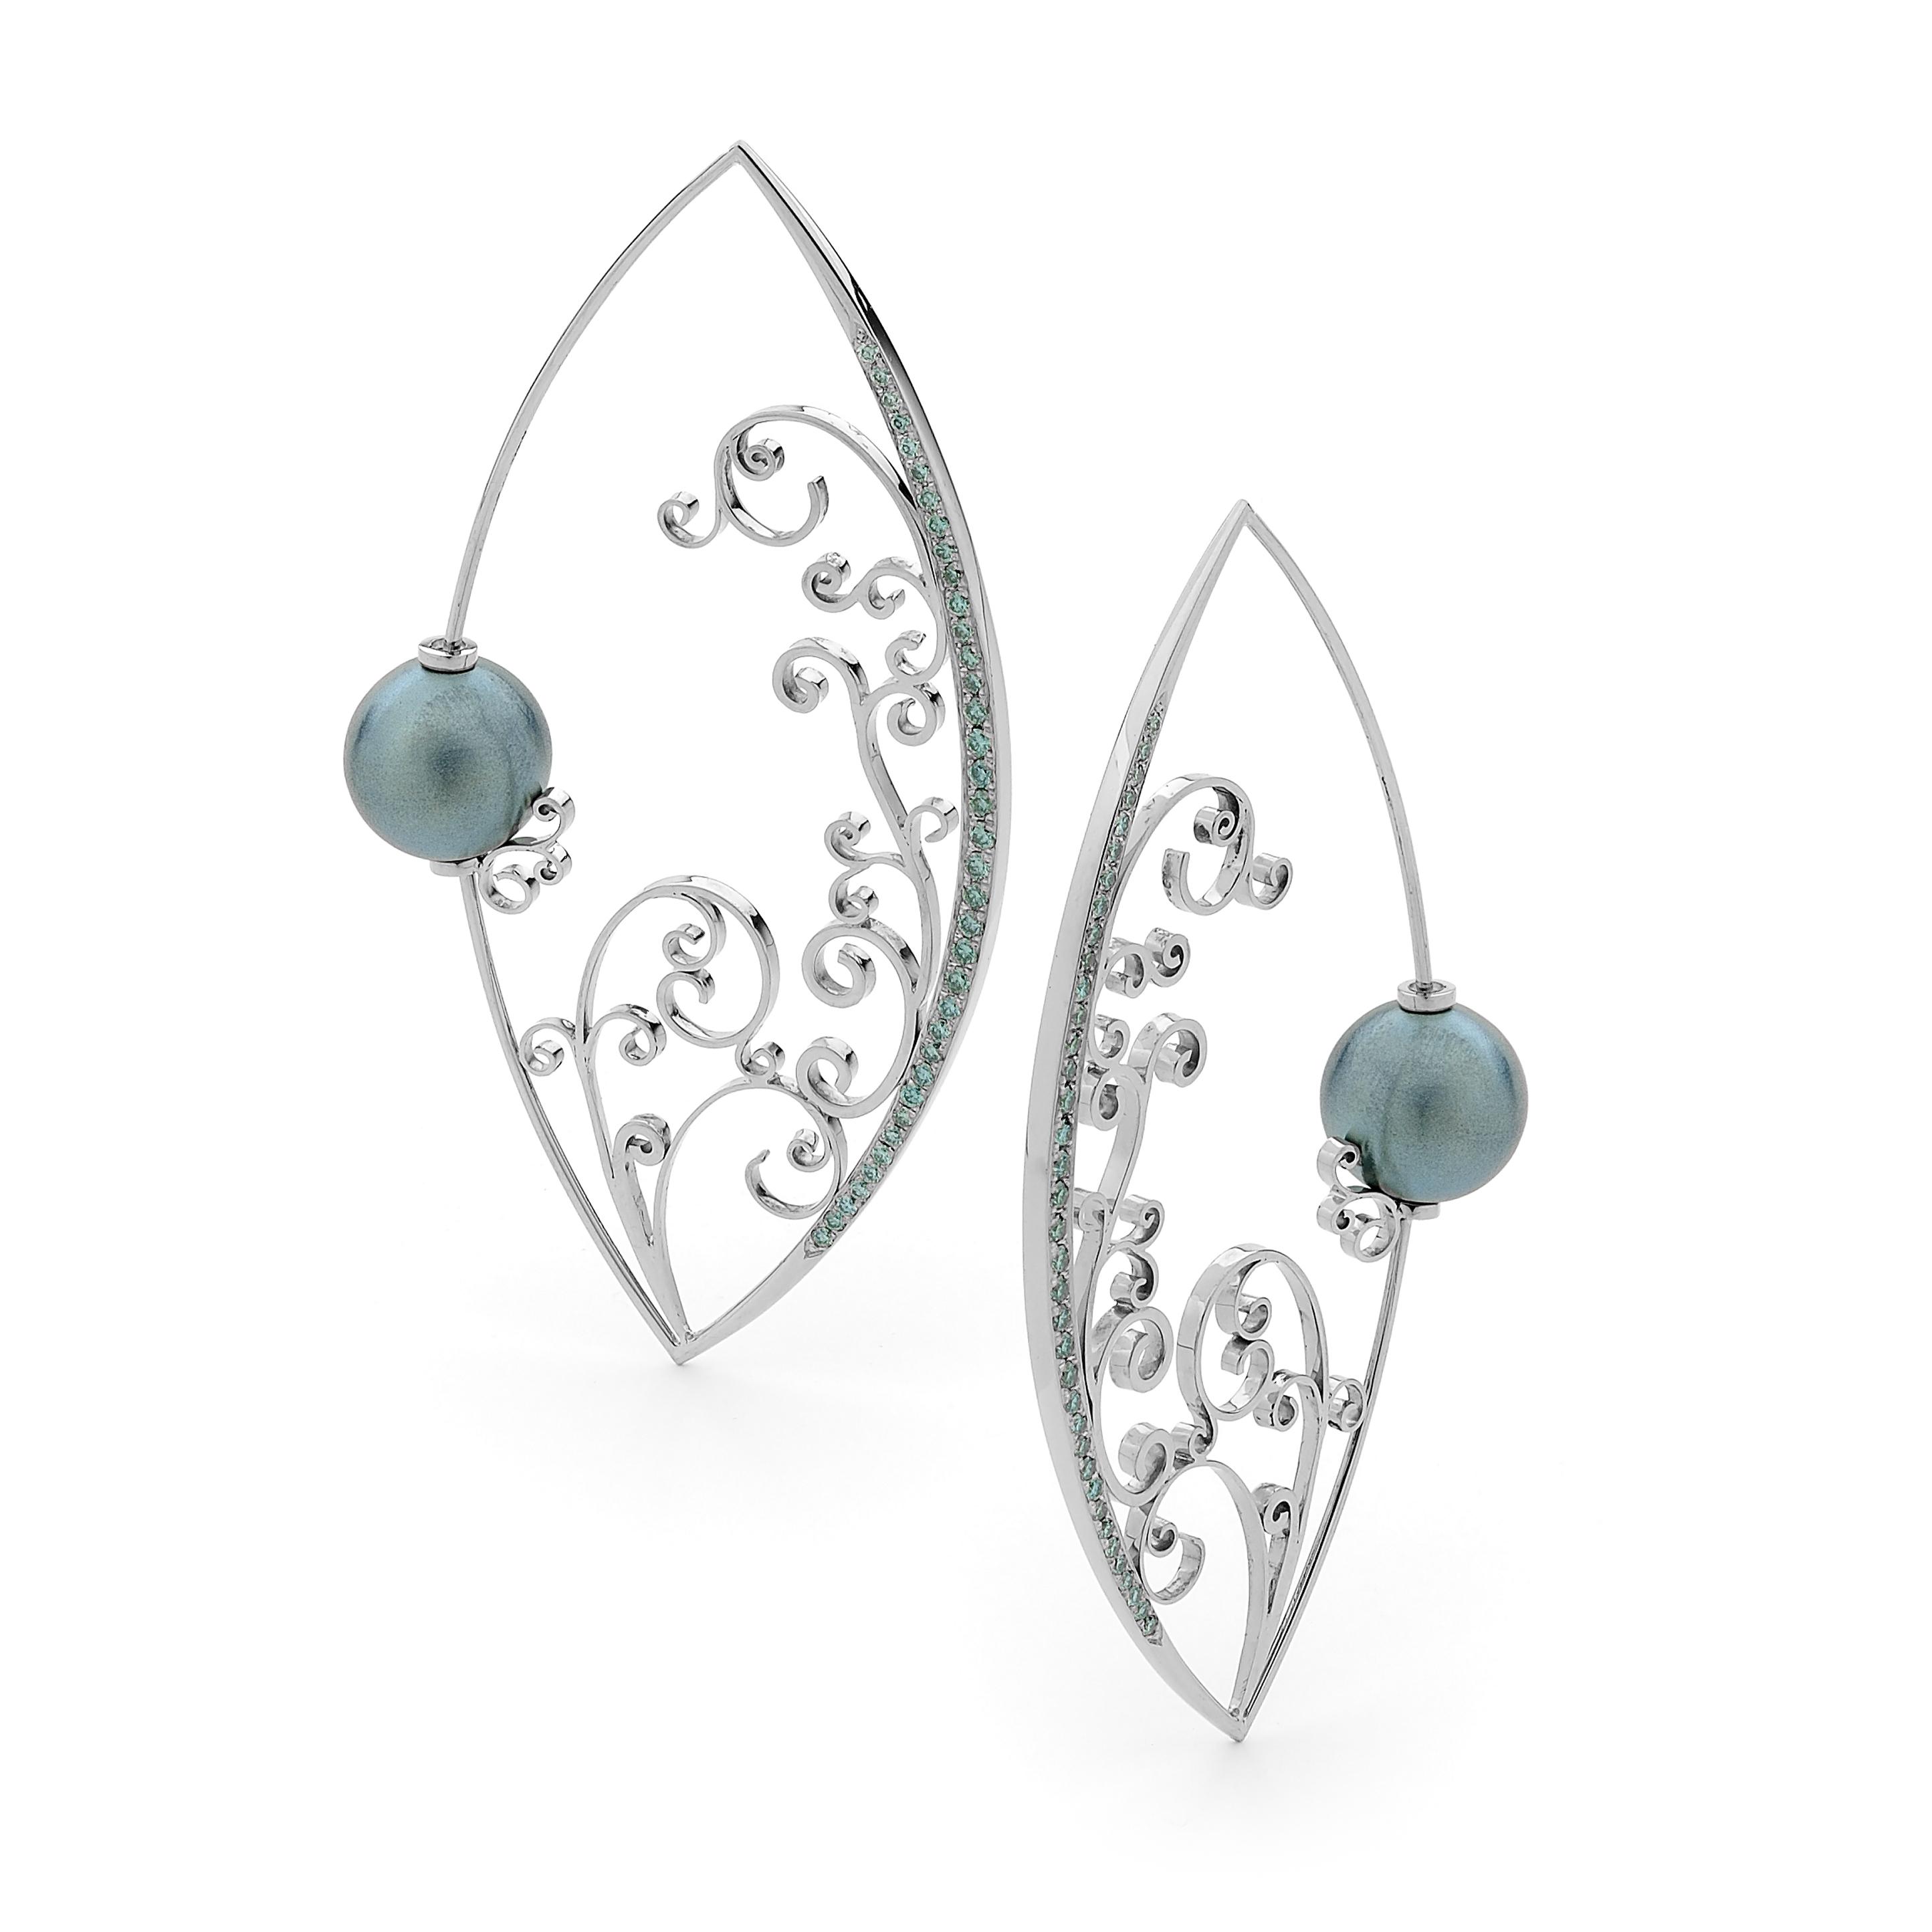 2889x2889 Jewellers Association Of Australia